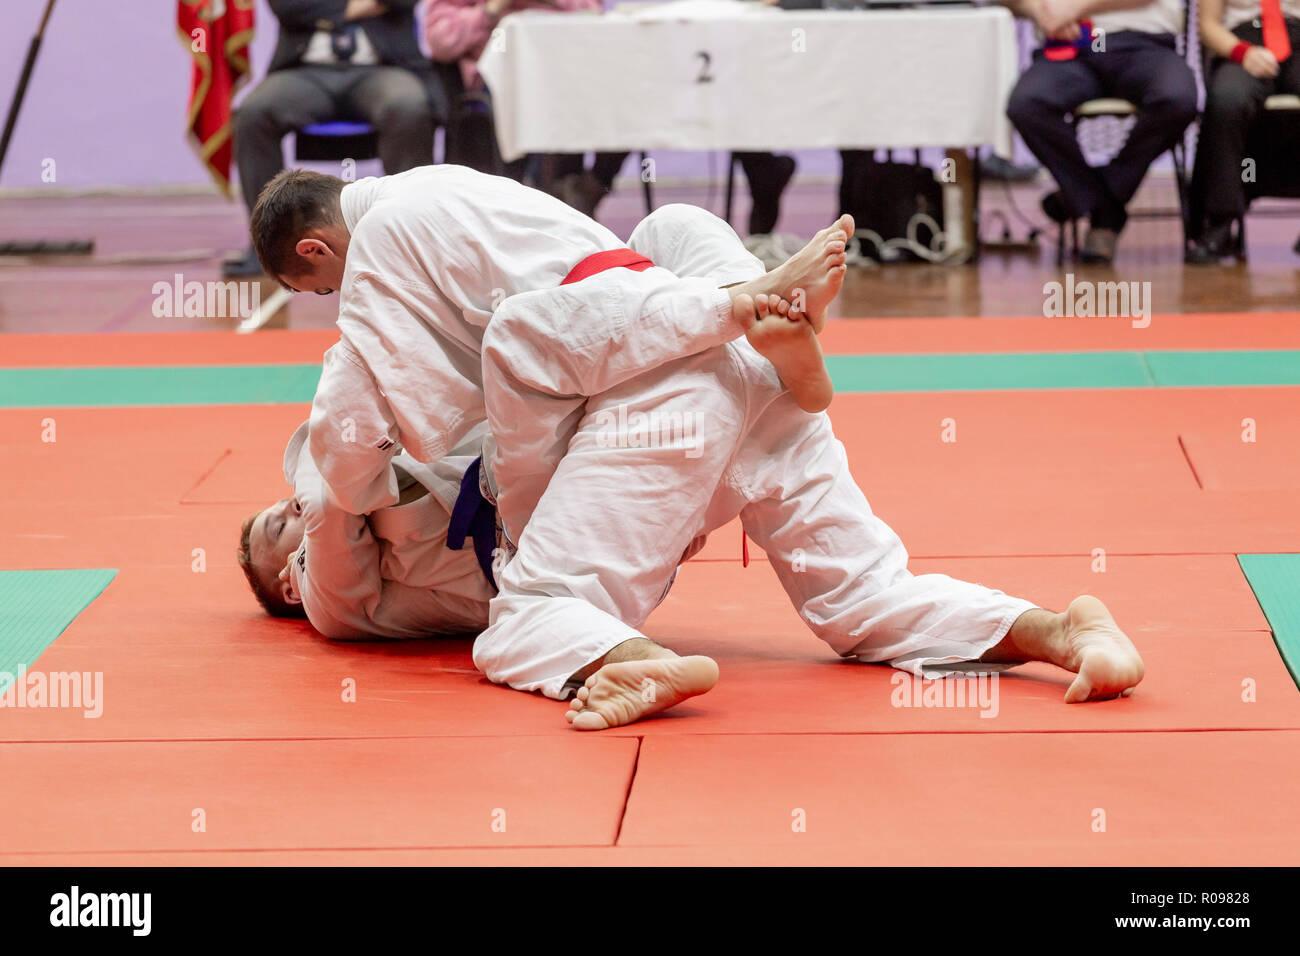 Russia, Vladivostok, 11/03/2018. Jiu-Jitsu wrestling competition among men. Martial arts and fighting sports tournament. - Stock Image